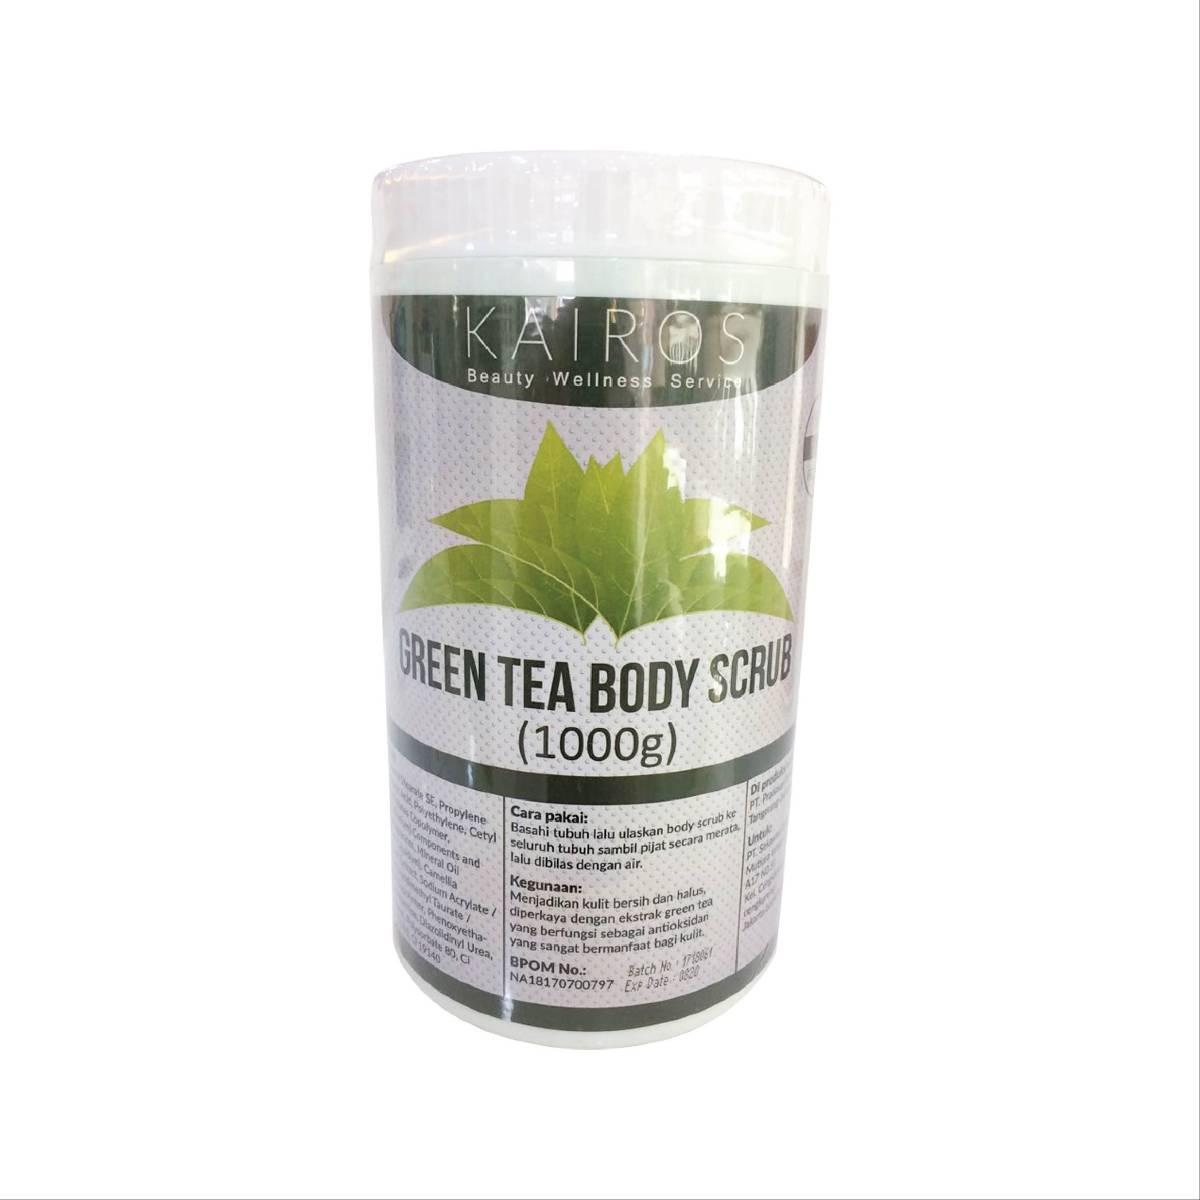 Kairos Green Tea Body Scrub - Scrub Yang Kaya Akan Antioksidan Sehingga Sangat Bermanfaat Bagi Kulit